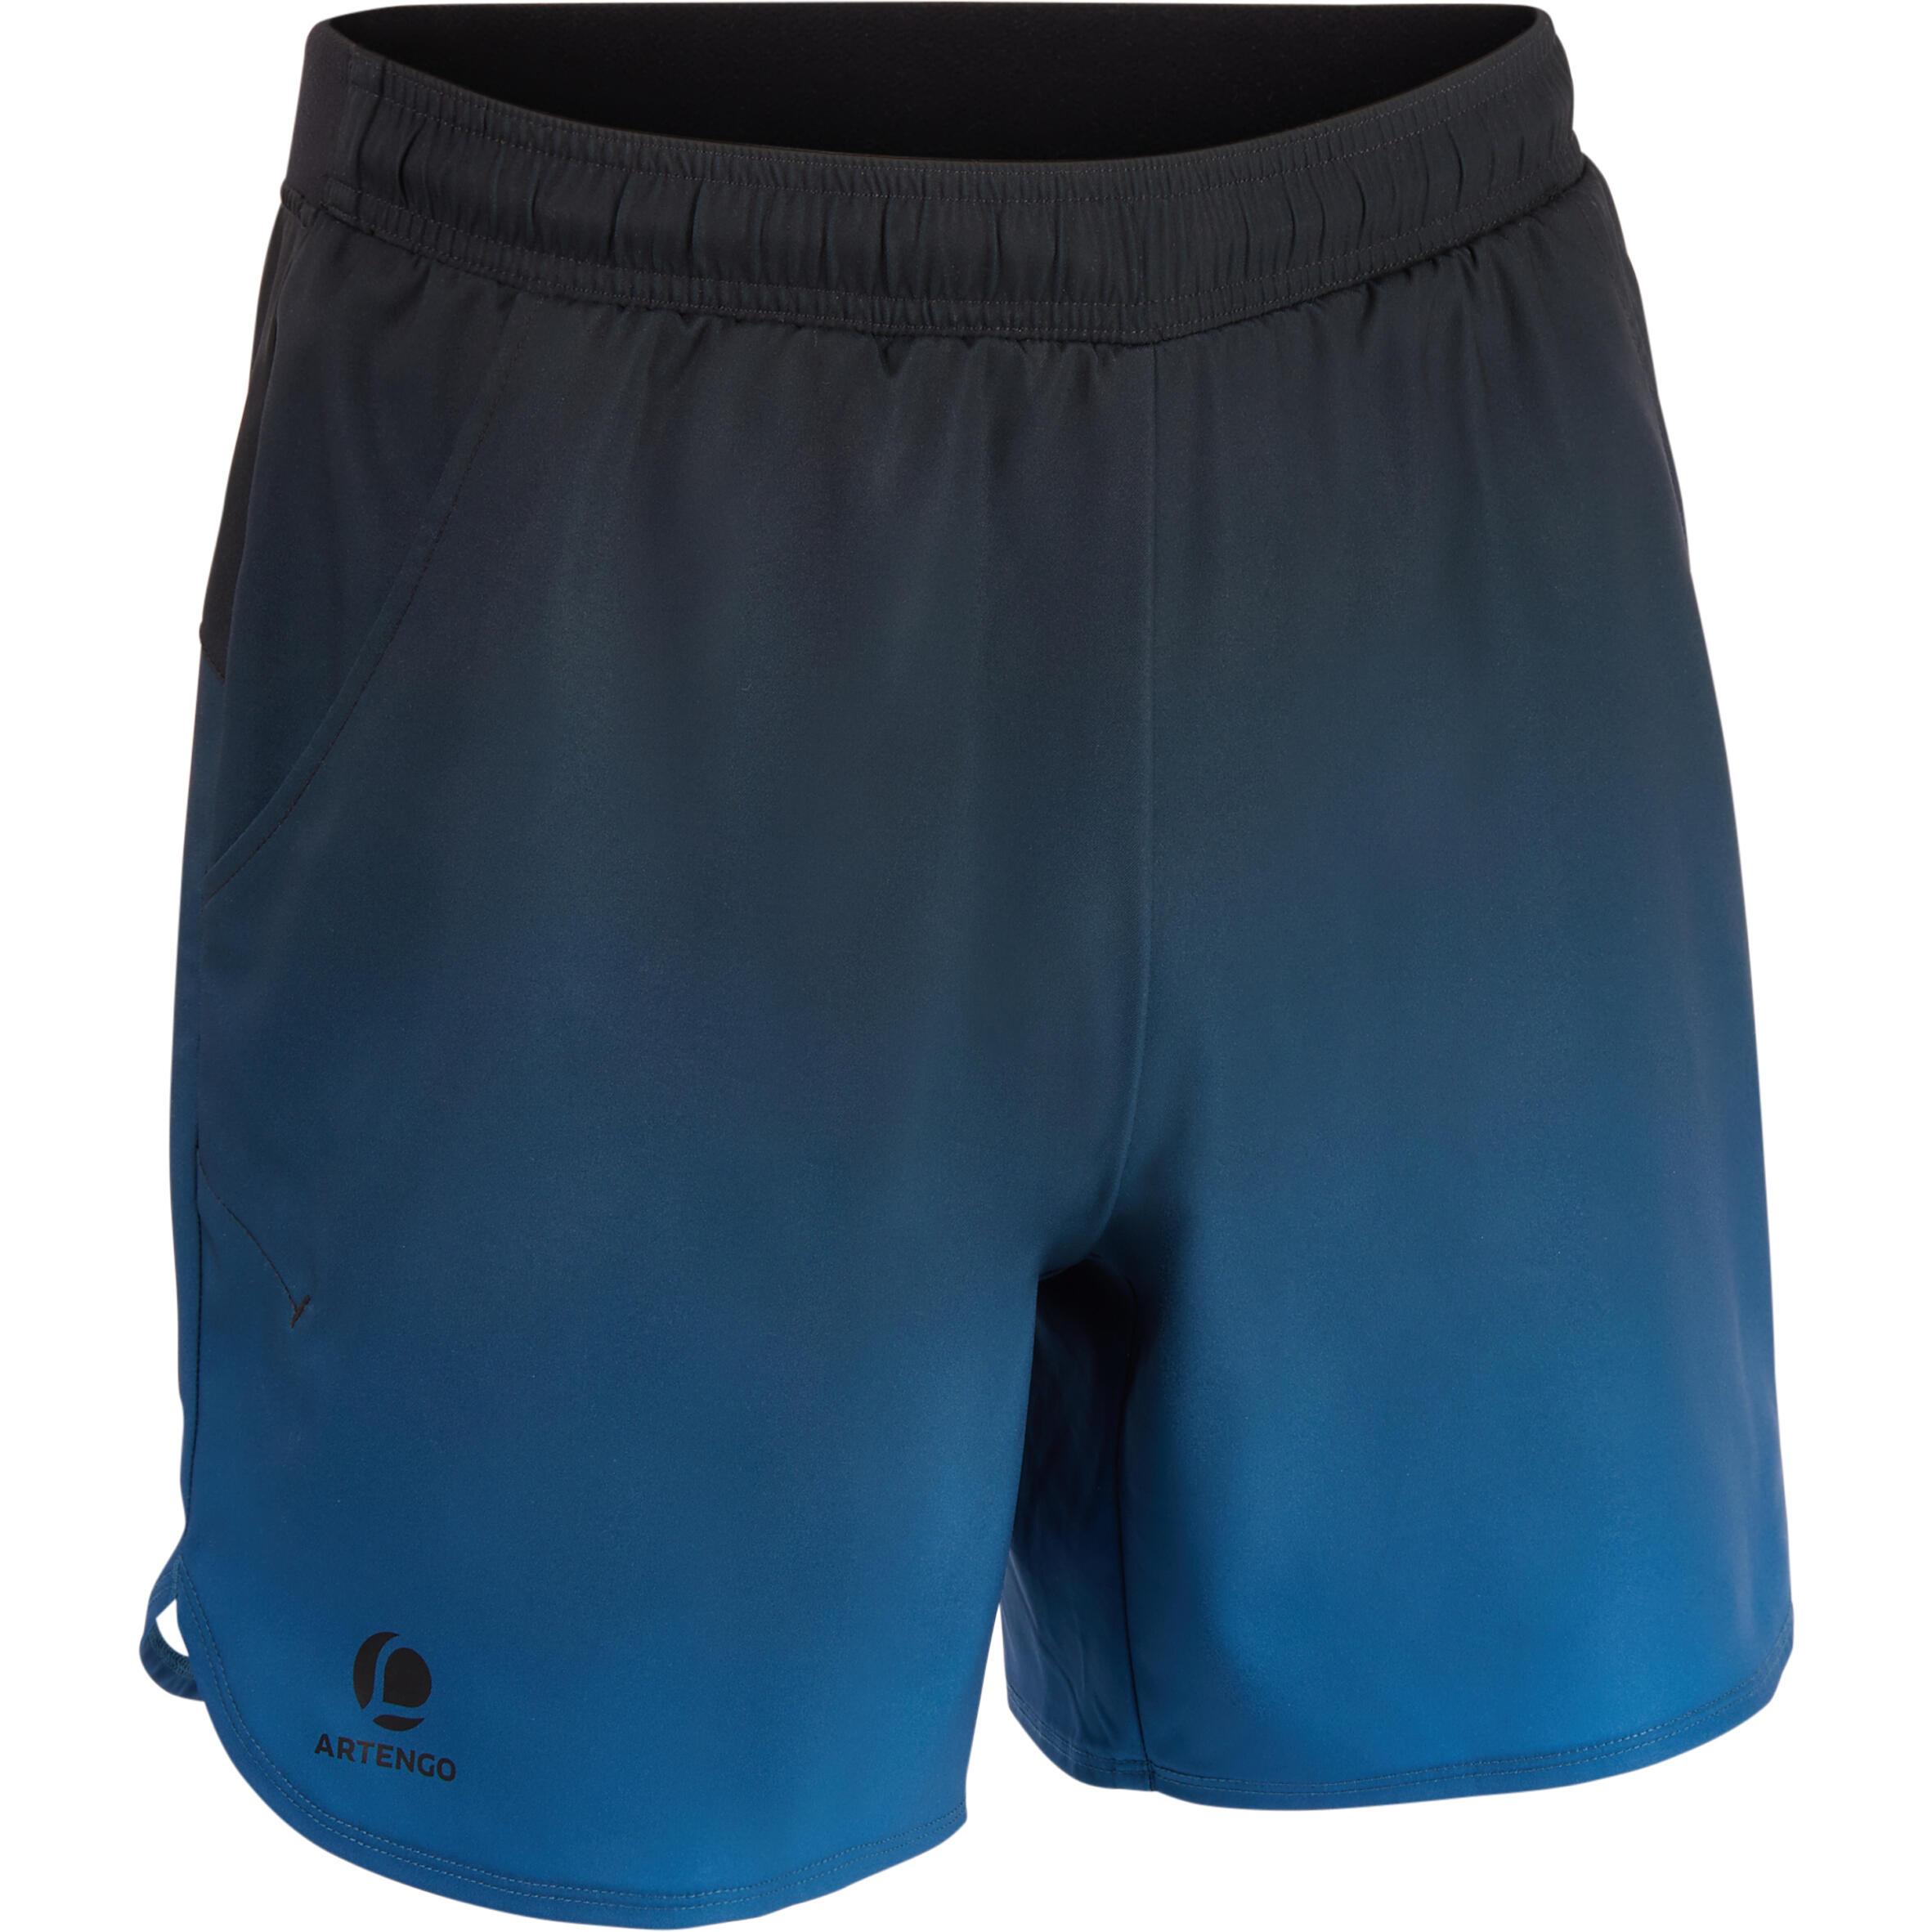 Artengo Tennisshort heren Dry 500 Court zwart/blauw